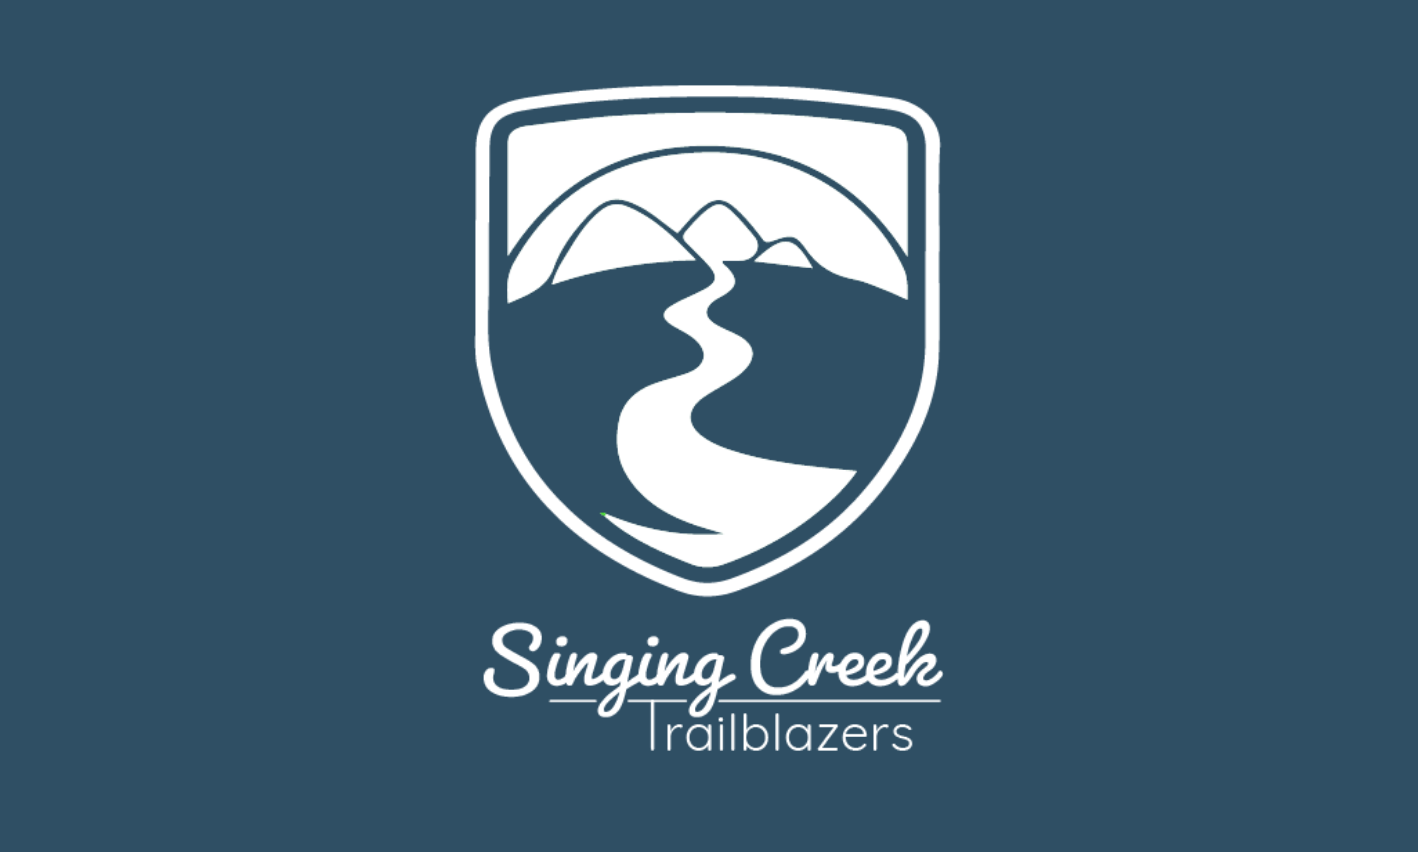 Singing Creek Trailblazers Logo White